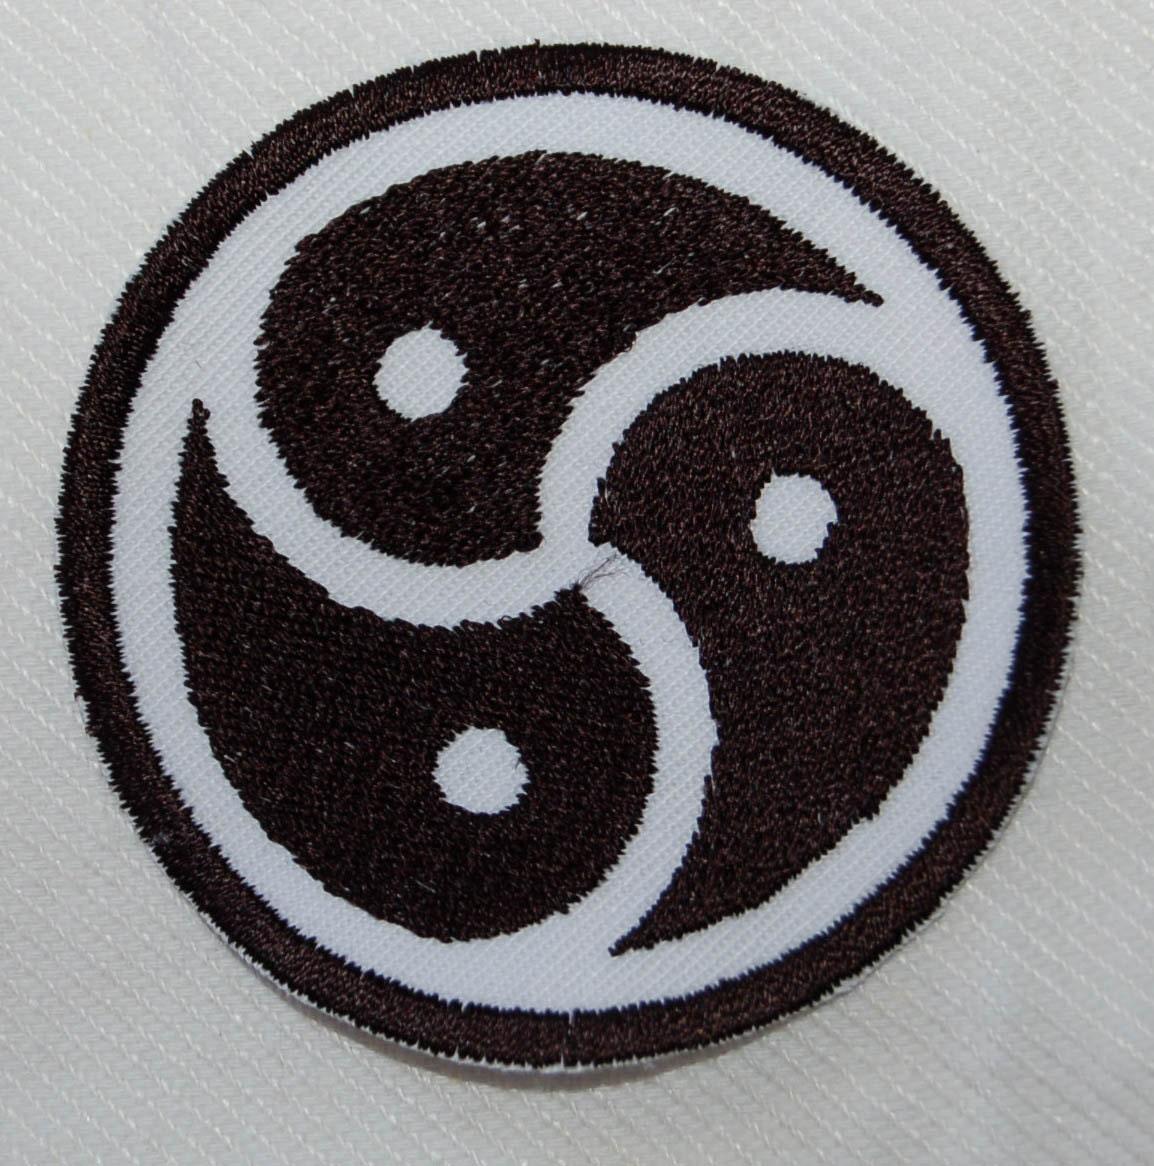 Symbol bdsm emblem